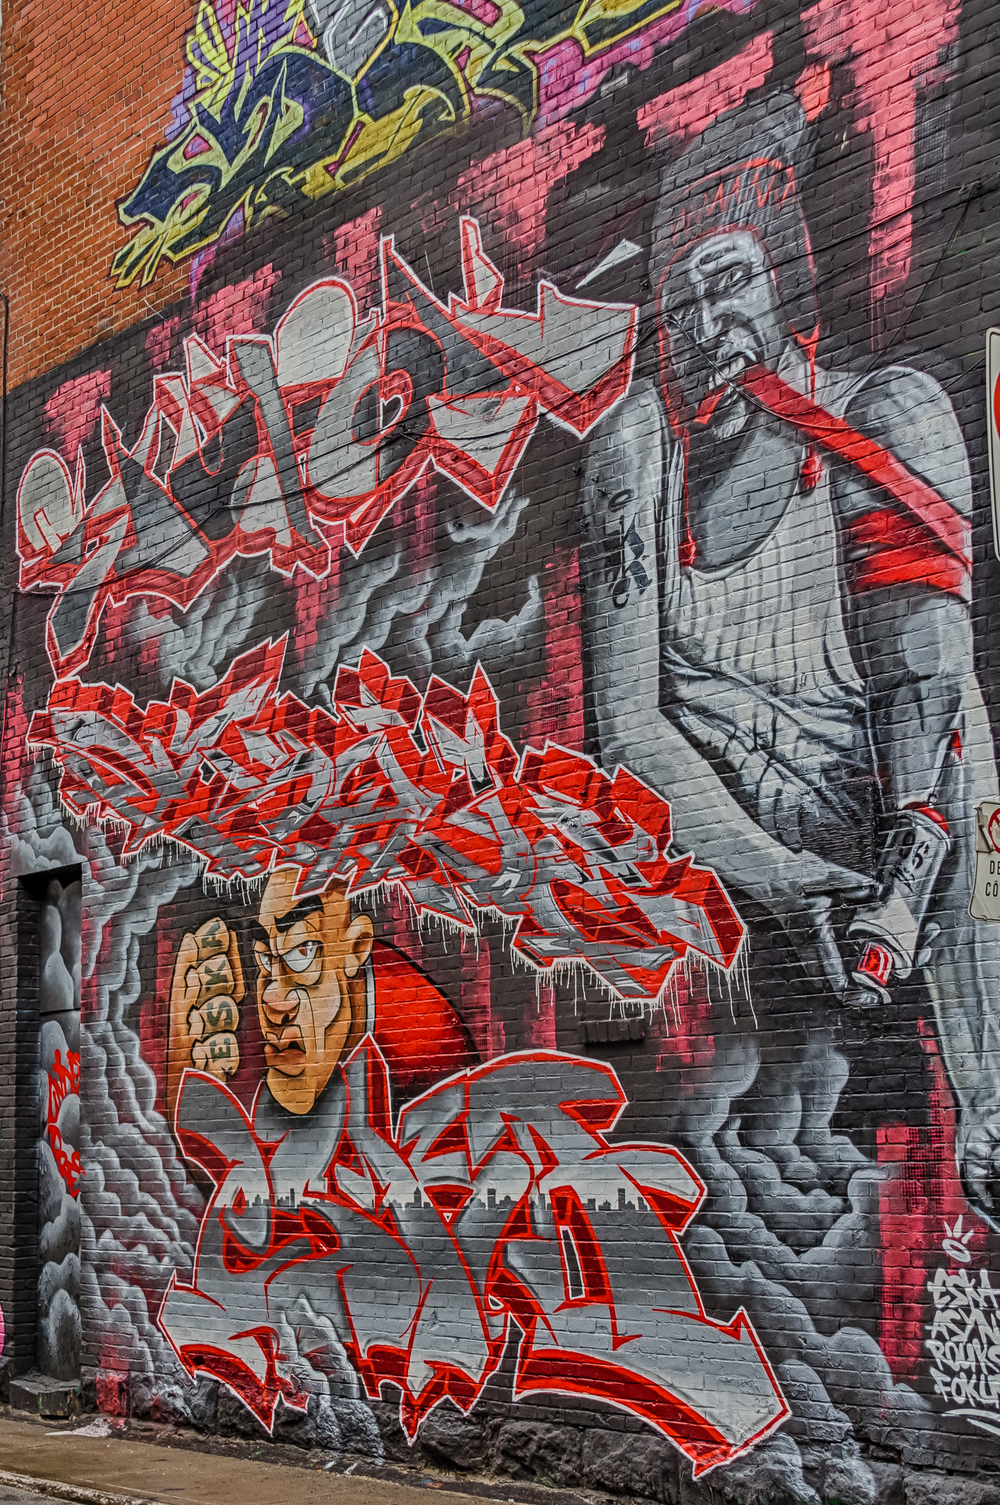 20140816_Grafitti and Architechture - Latin Quarter_IMG_5690_HDR-M.jpg